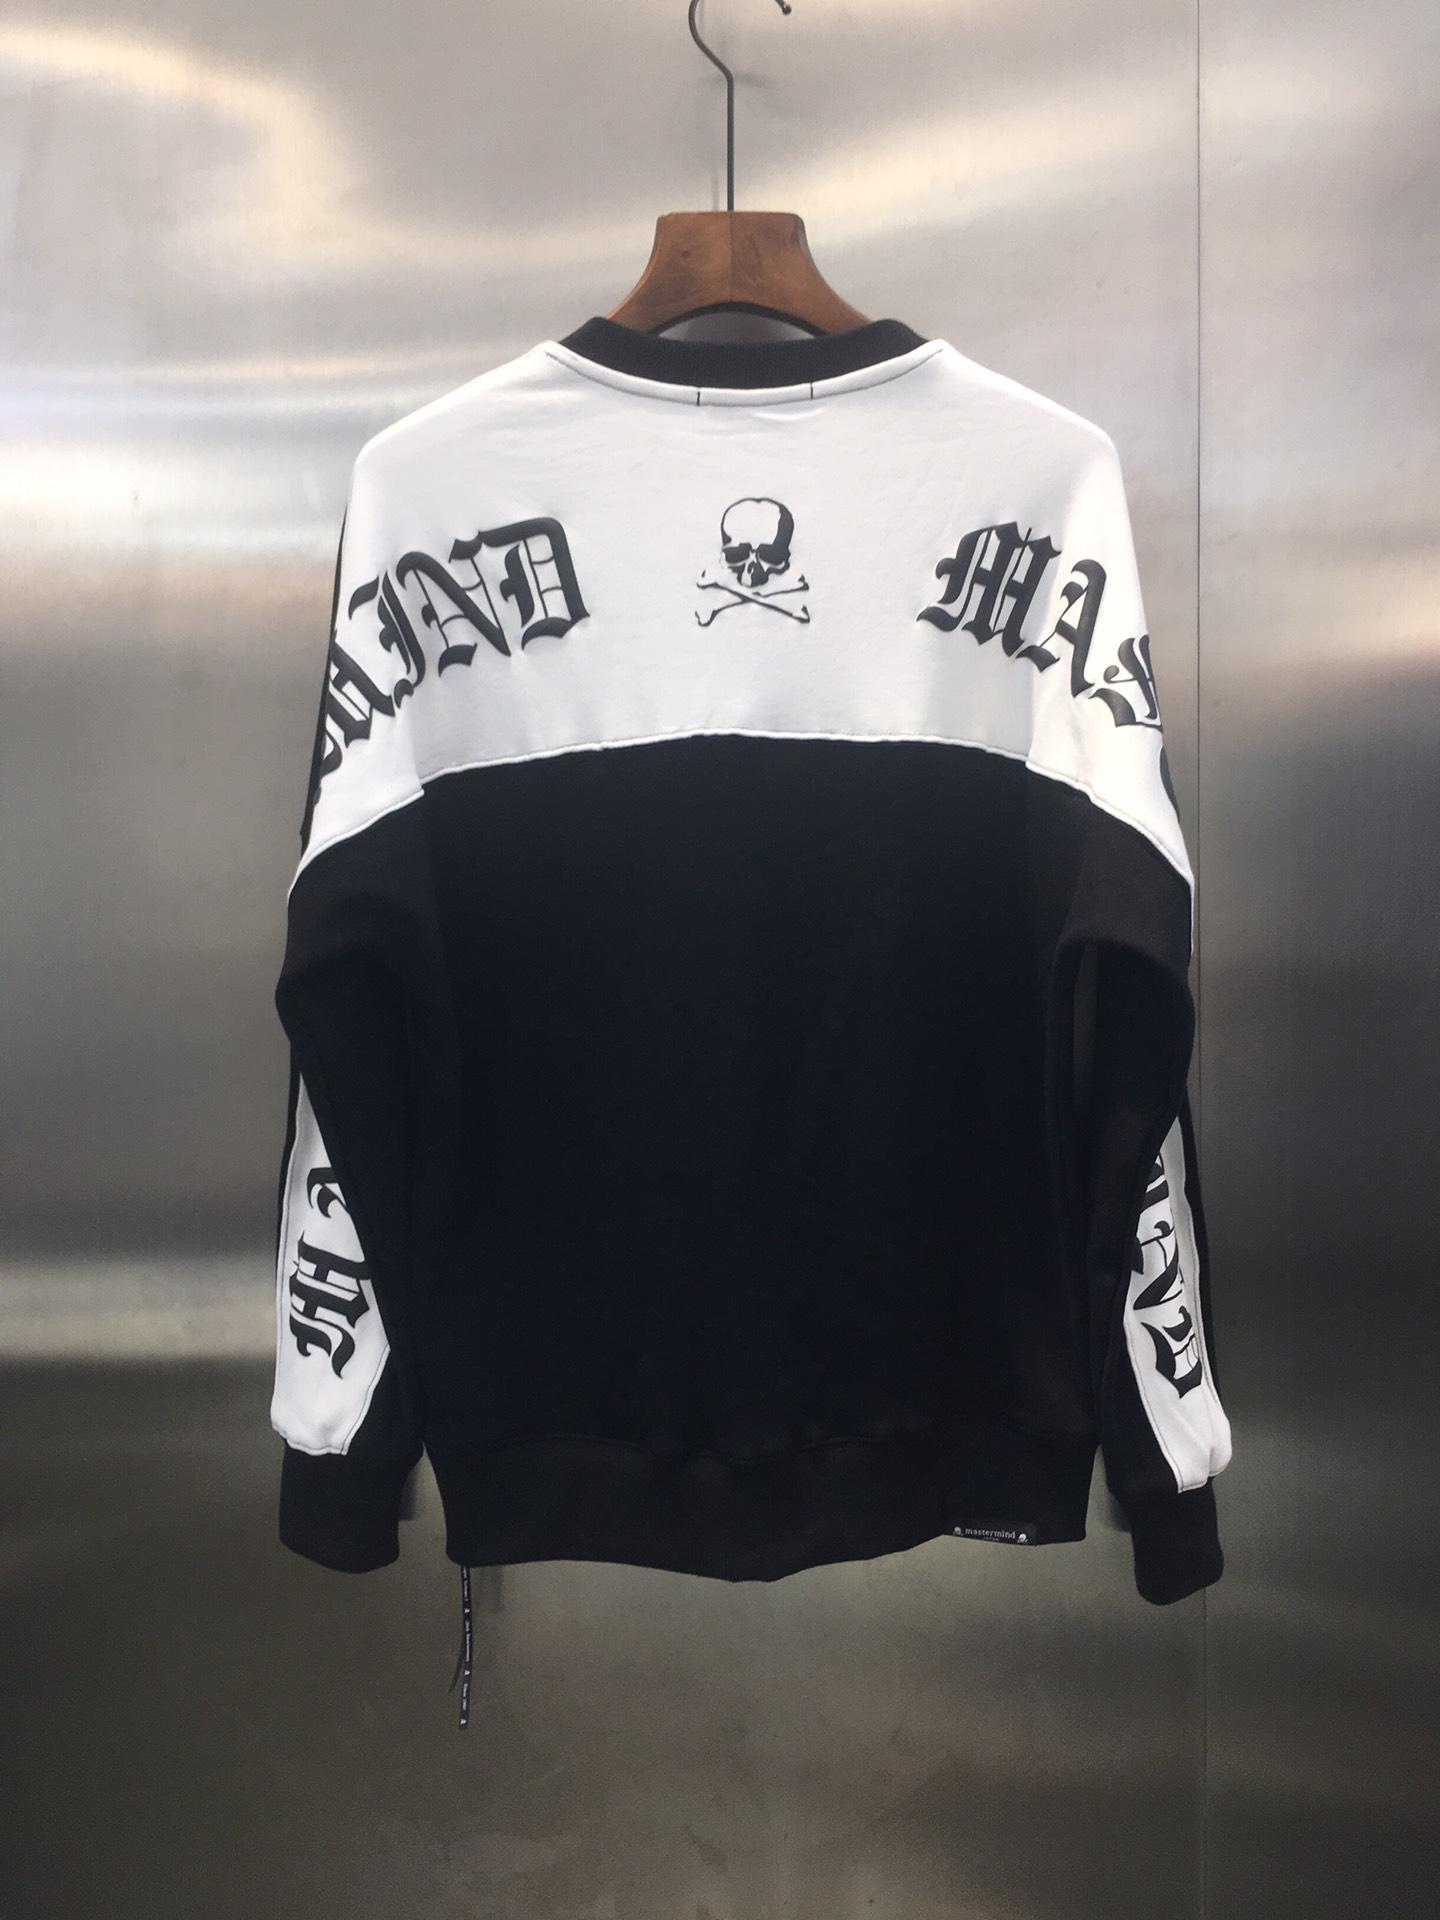 3XL Japan Mastermind MMJ Hoodies Men Women Streetwear Harajuku Xxxtentacion Mastermind Kanye Sweatshirts Men Stranger Things